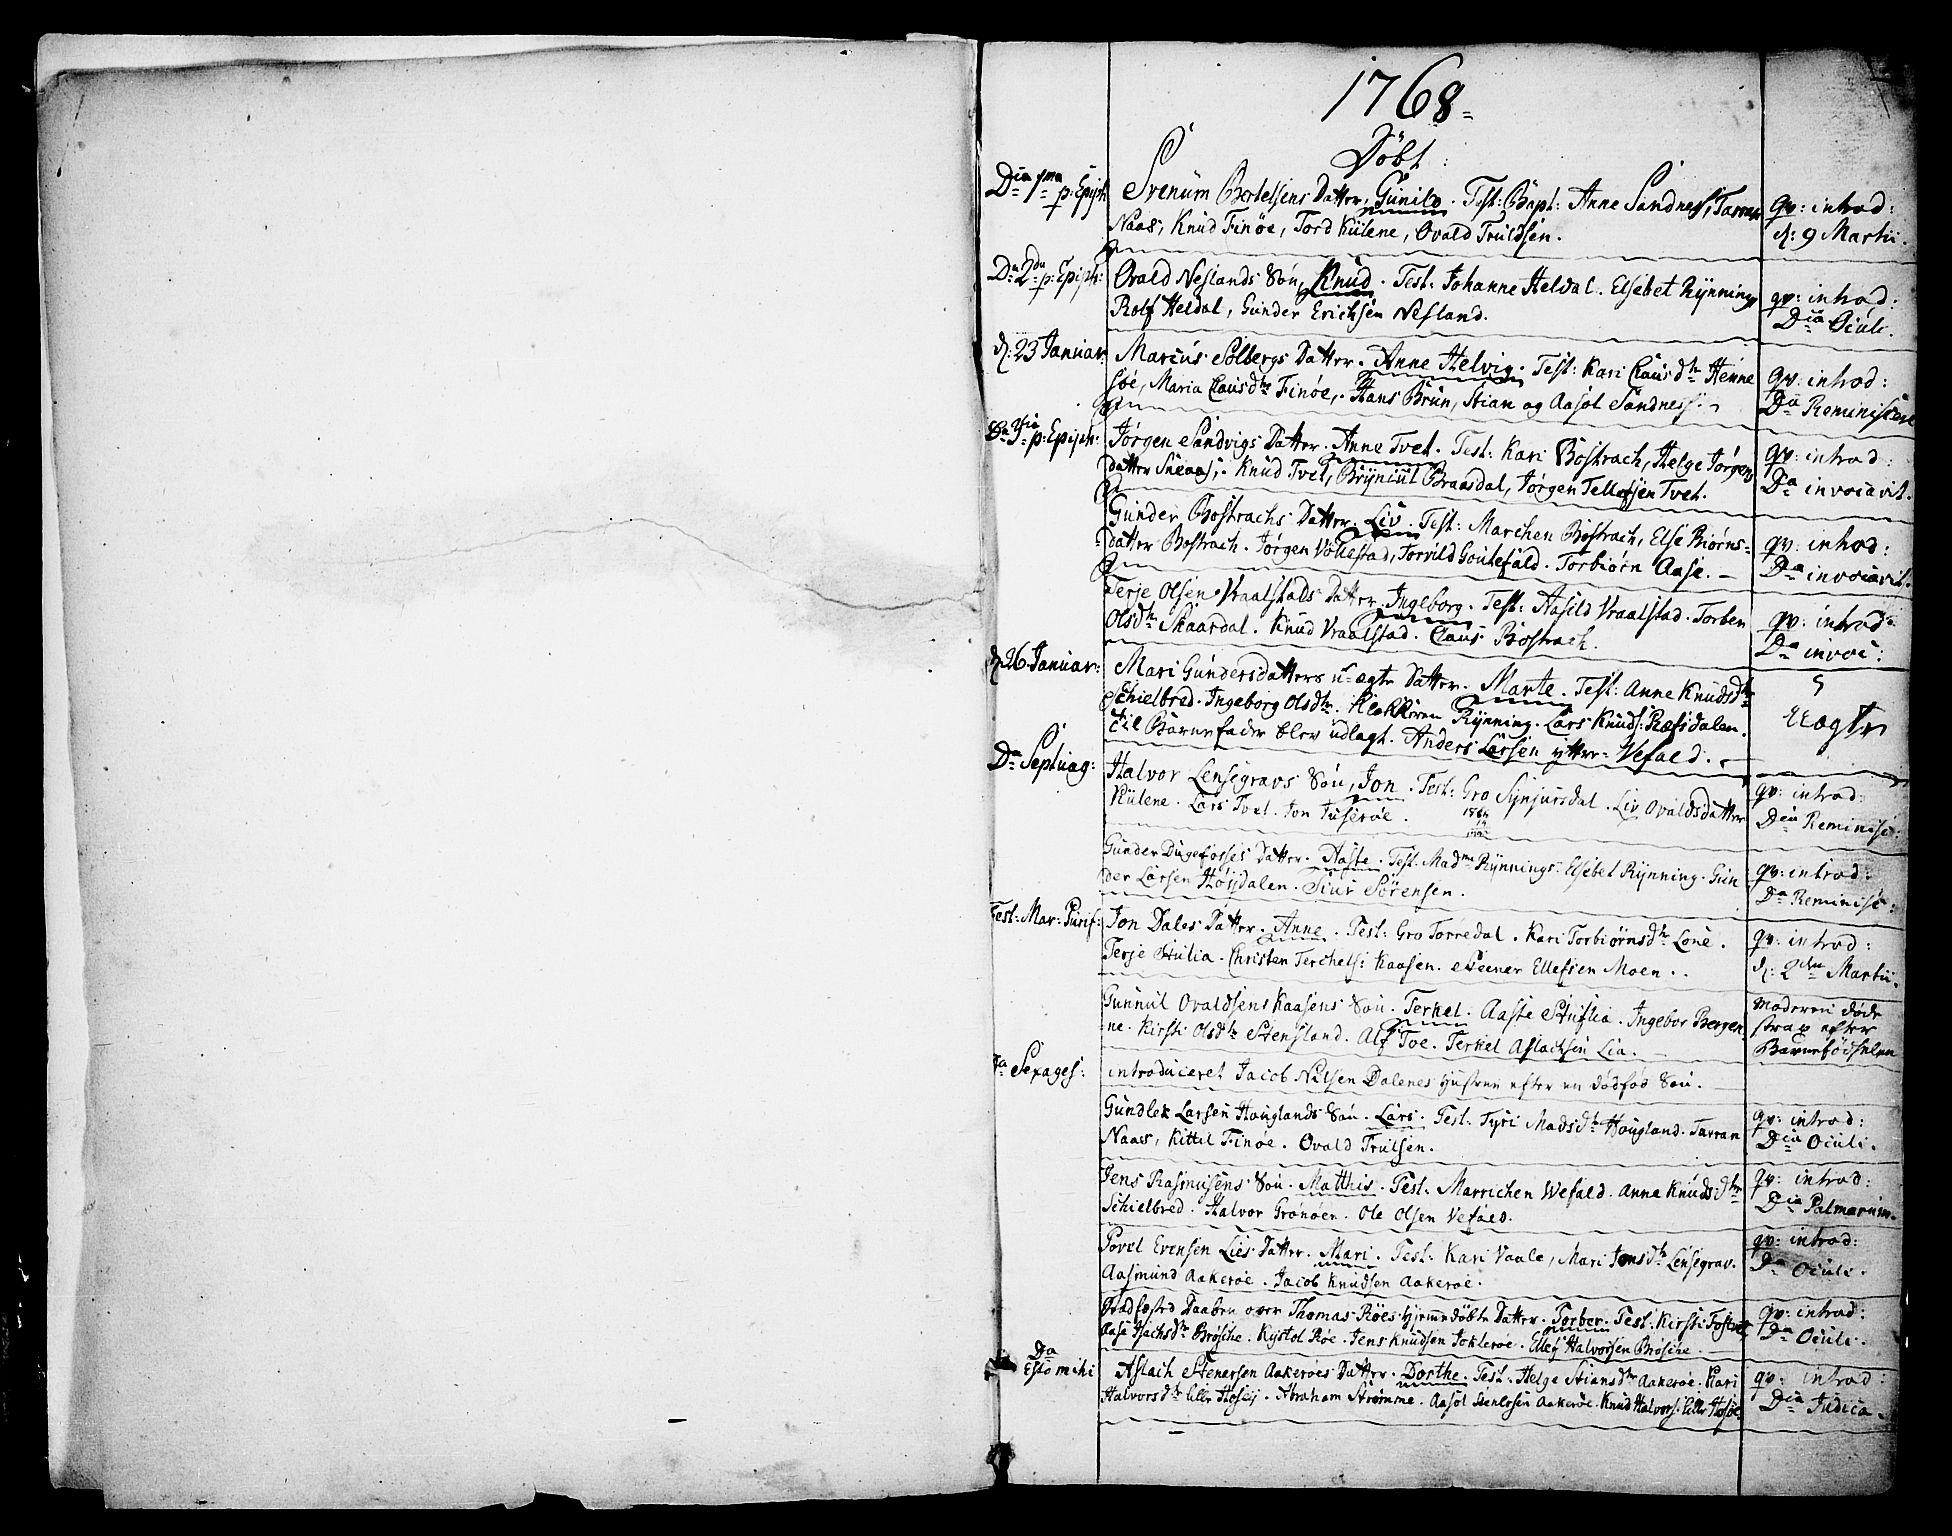 SAKO, Drangedal kirkebøker, F/Fa/L0003: Ministerialbok nr. 3, 1768-1814, s. 0-1